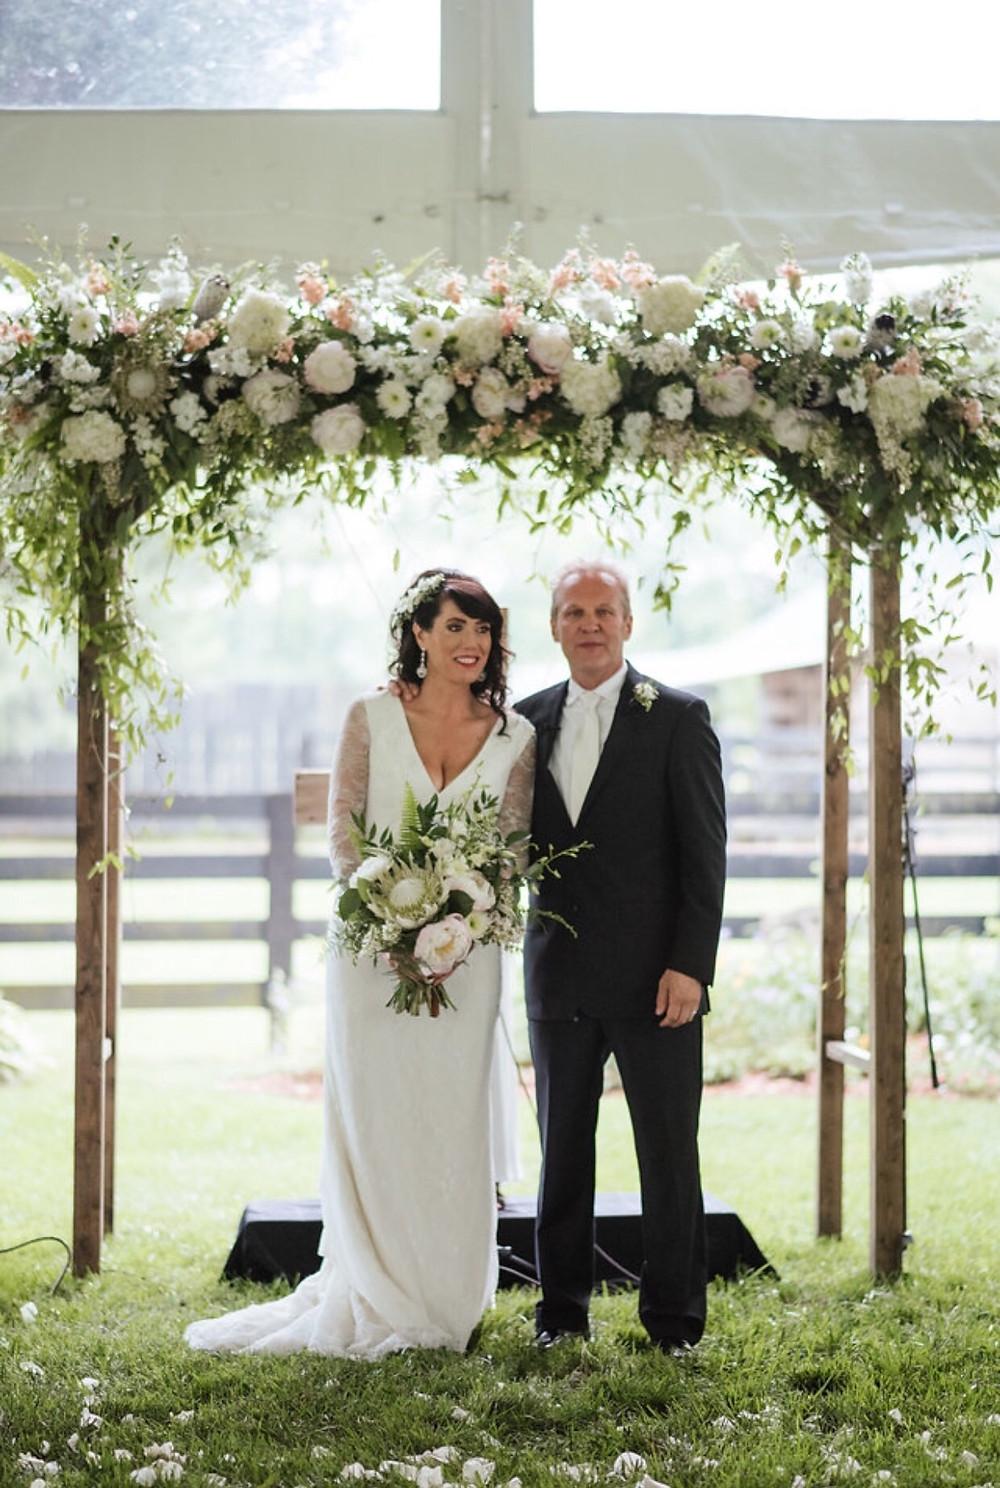 Franklin, TN Wedding + Floral Arbor